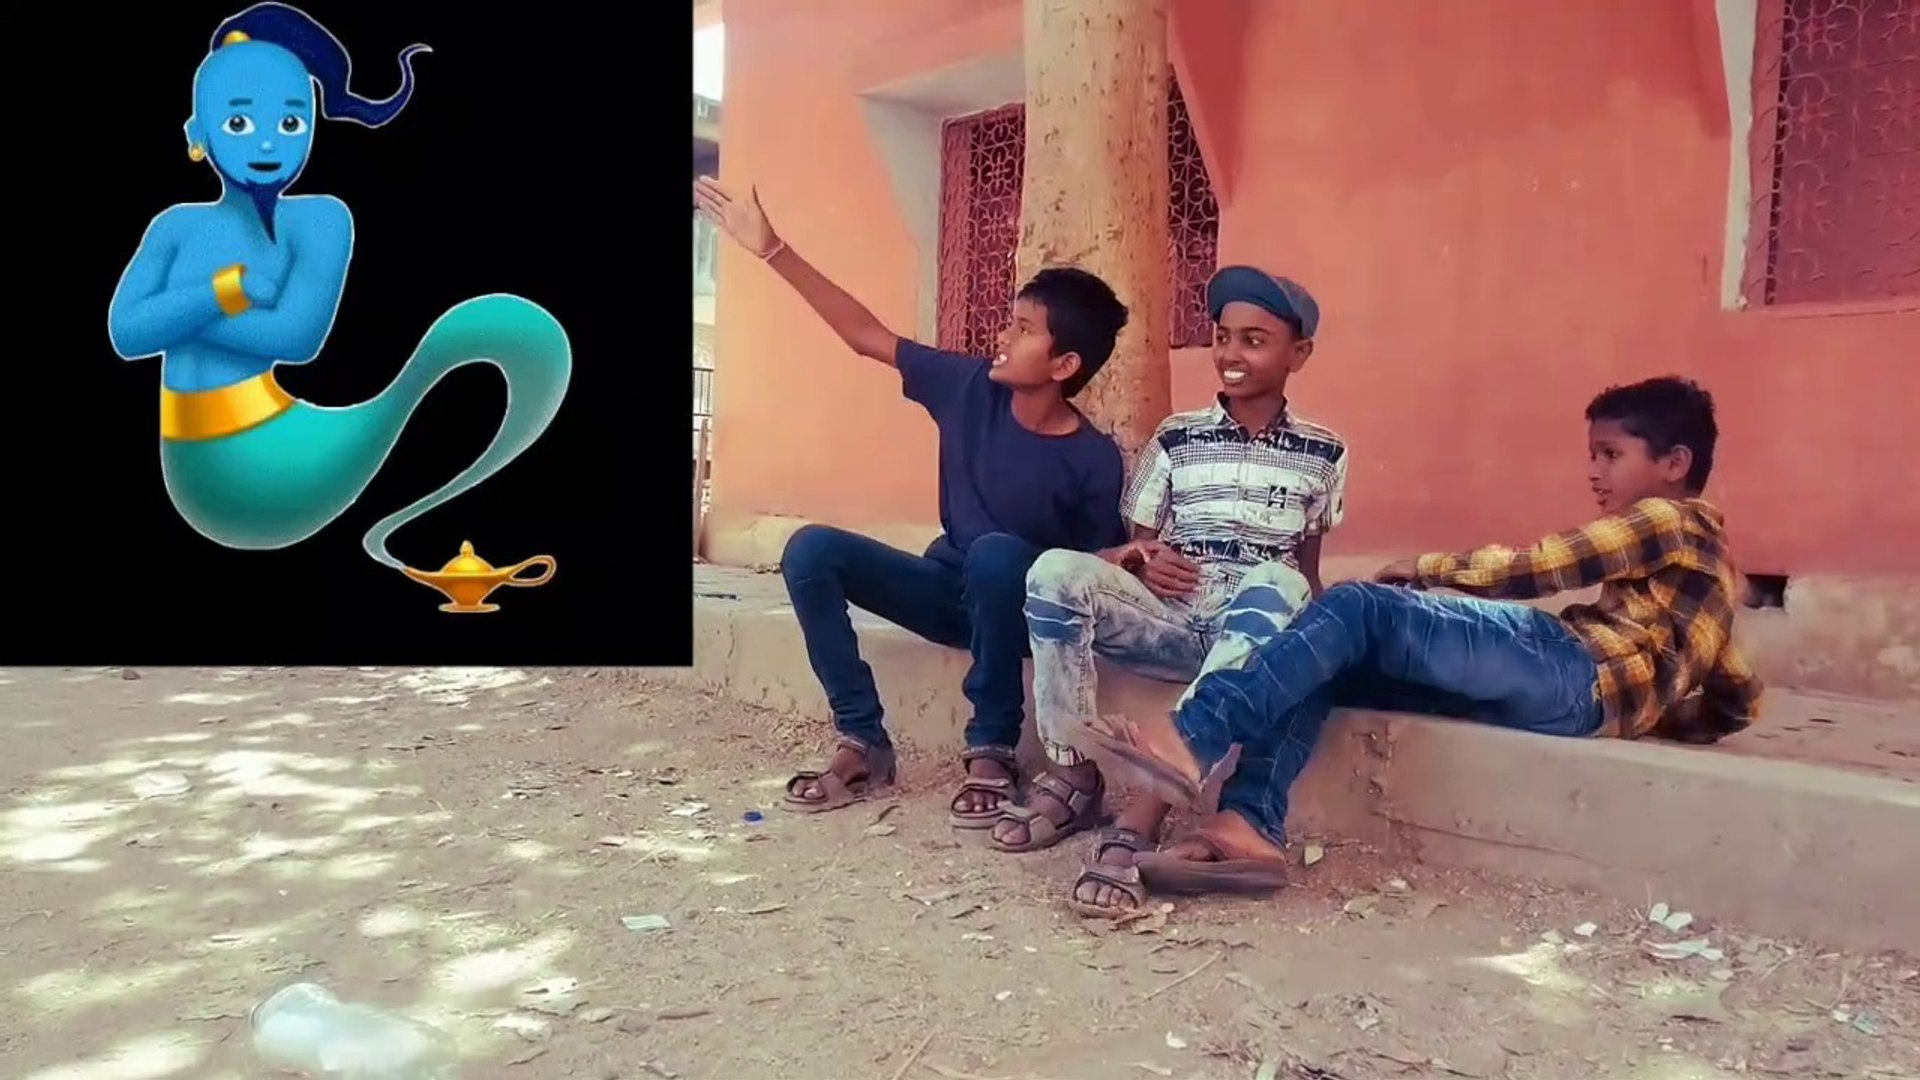 Ginee comedy hindi || ginee comedy endless comedy 2020